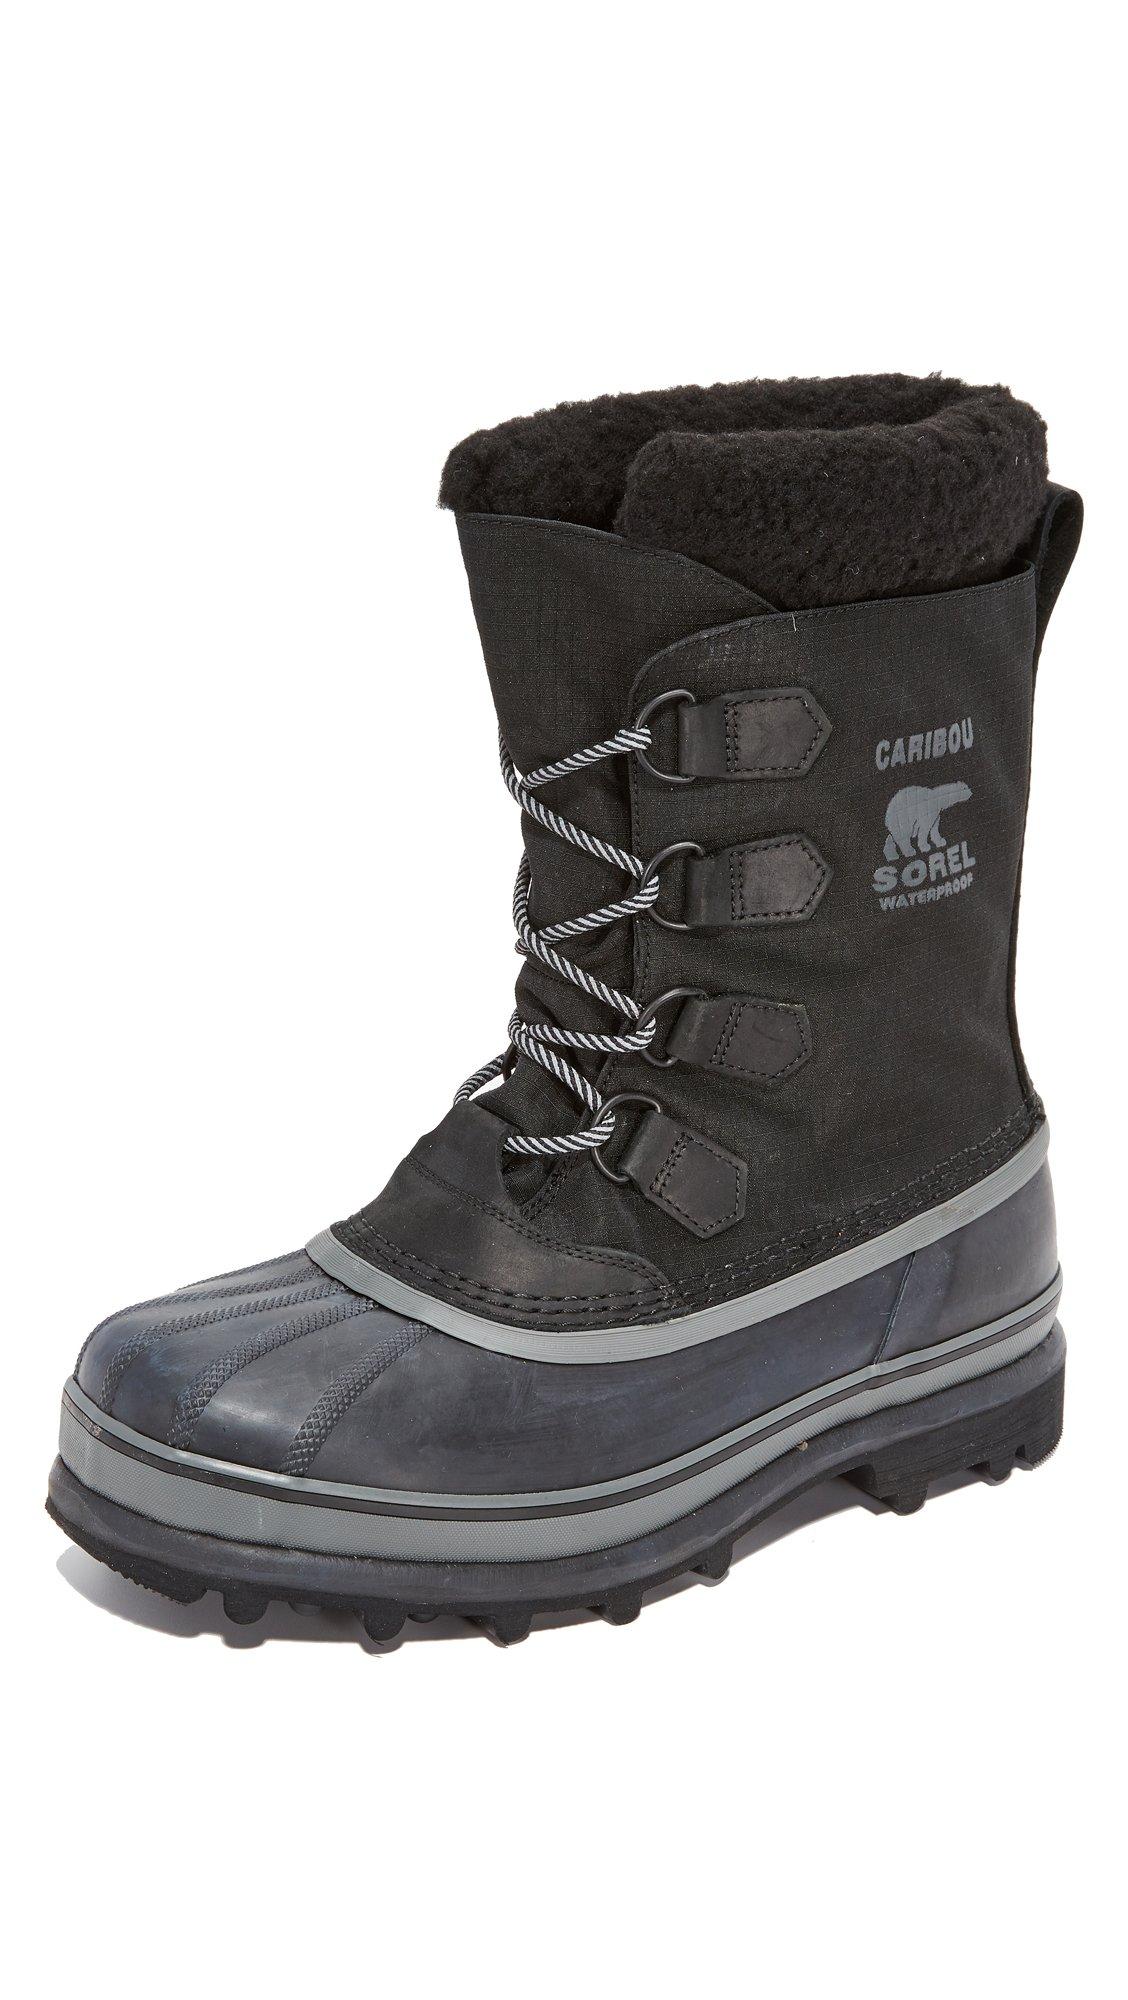 Sorel Men's Caribou Reflective WL Boots, Black, 10.5 D(M) US